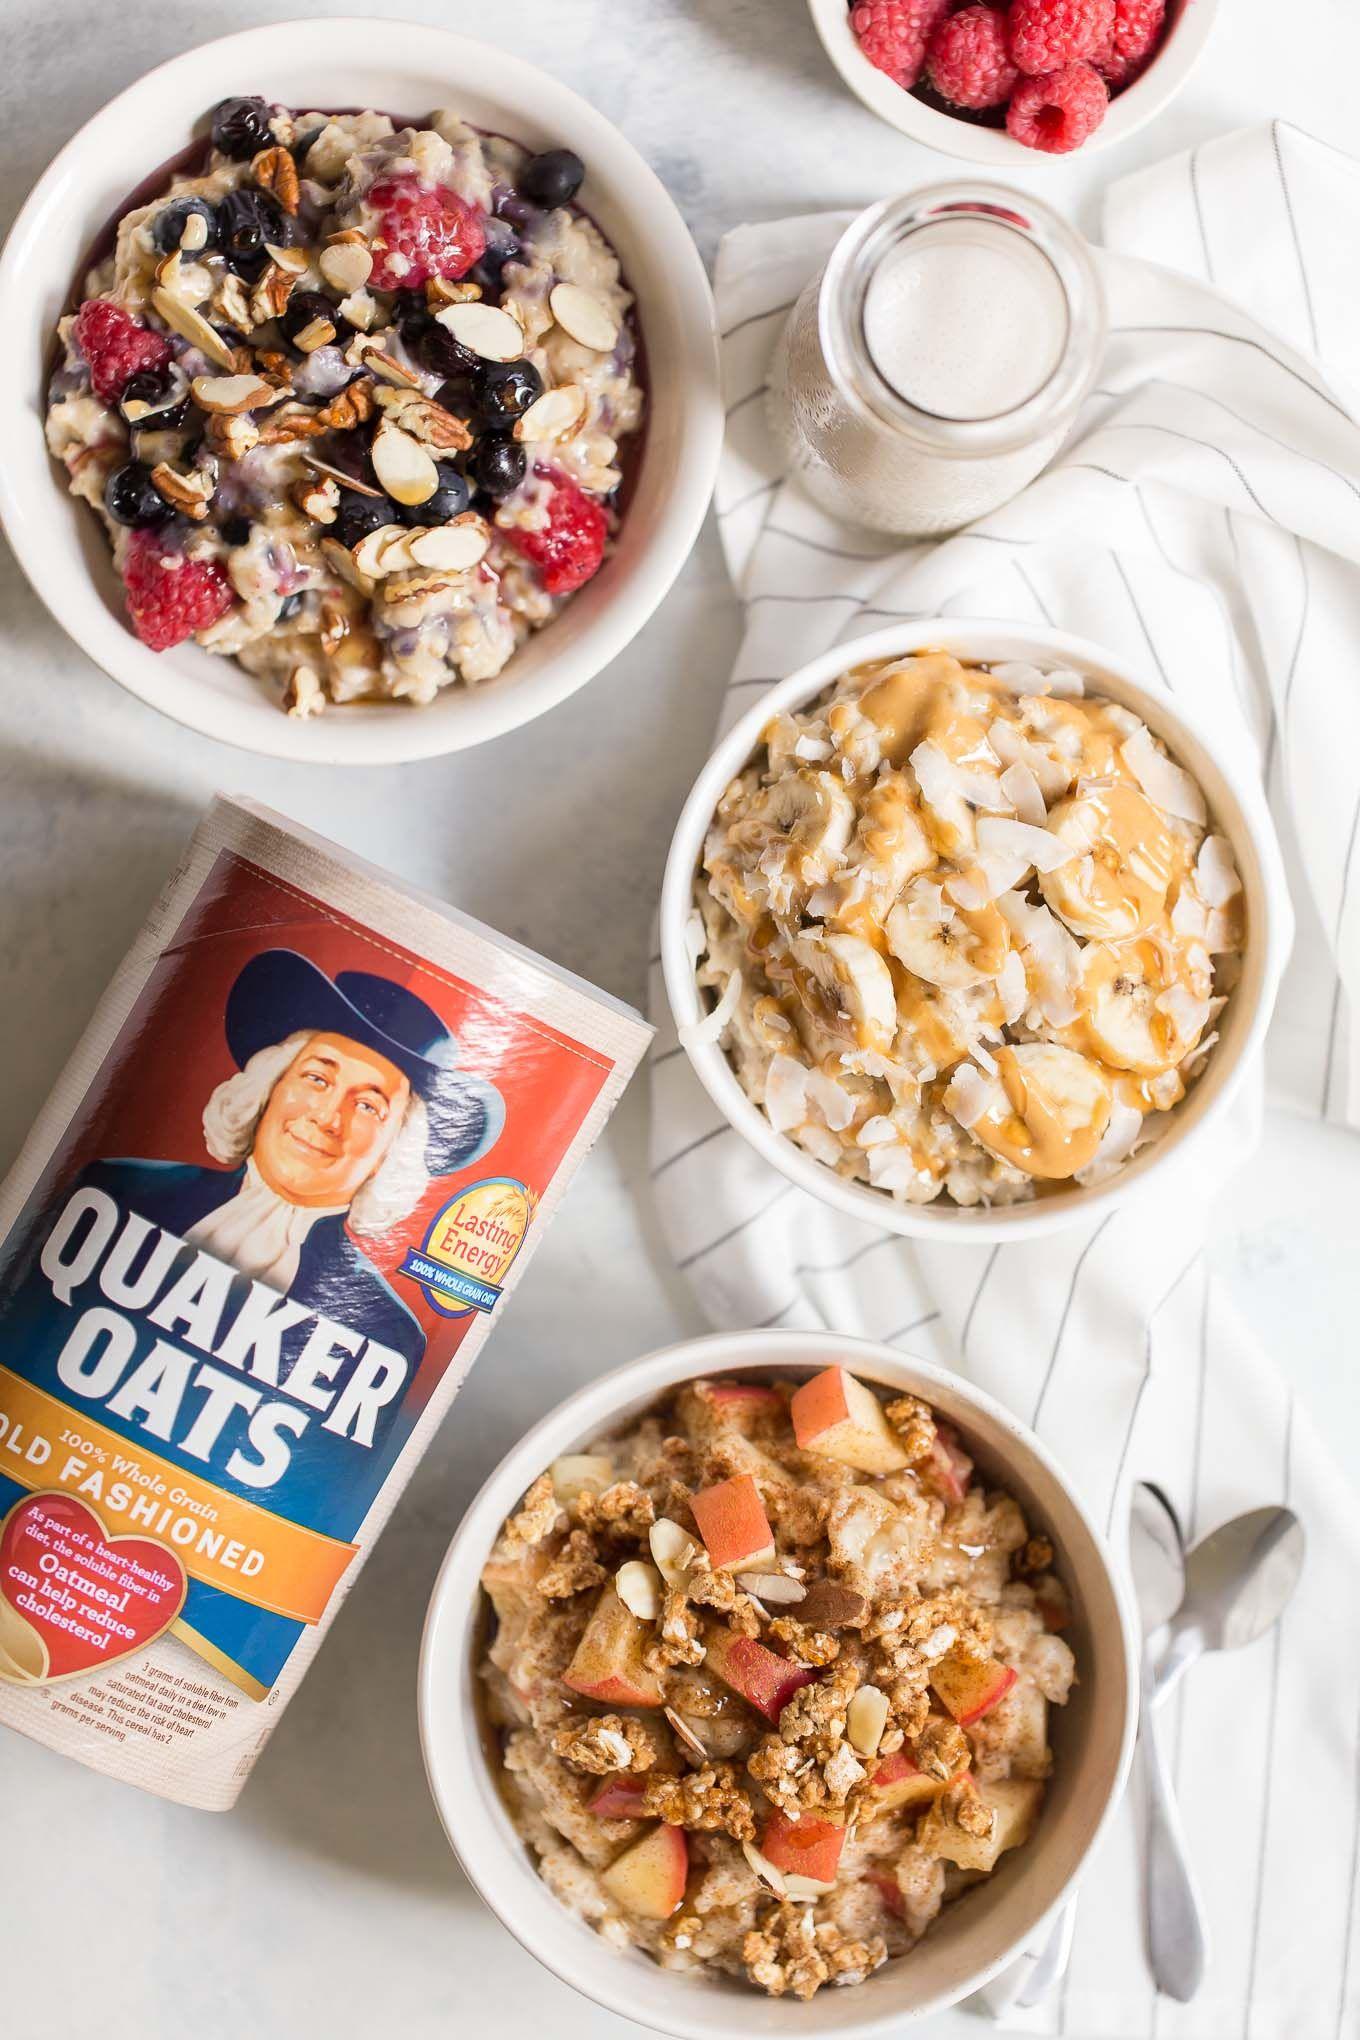 Slow Cooker Oatmeal 3 Ways Recipe Slow Cooker Oatmeal Quaker Oats Recipes Slow Cooker Oatmeal Recipes